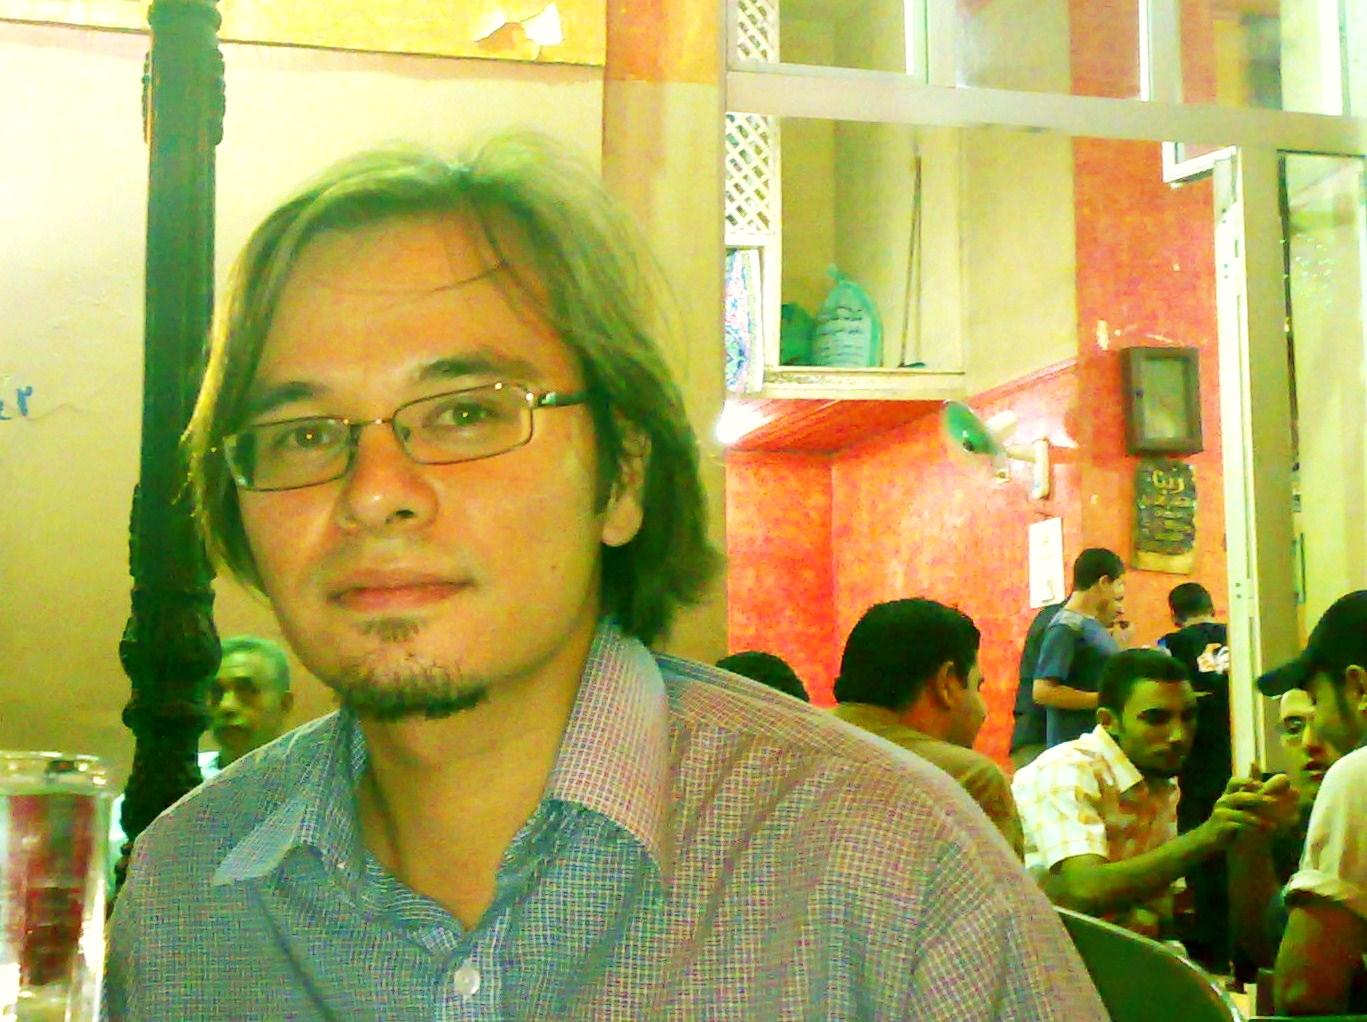 During Ramadan 2008